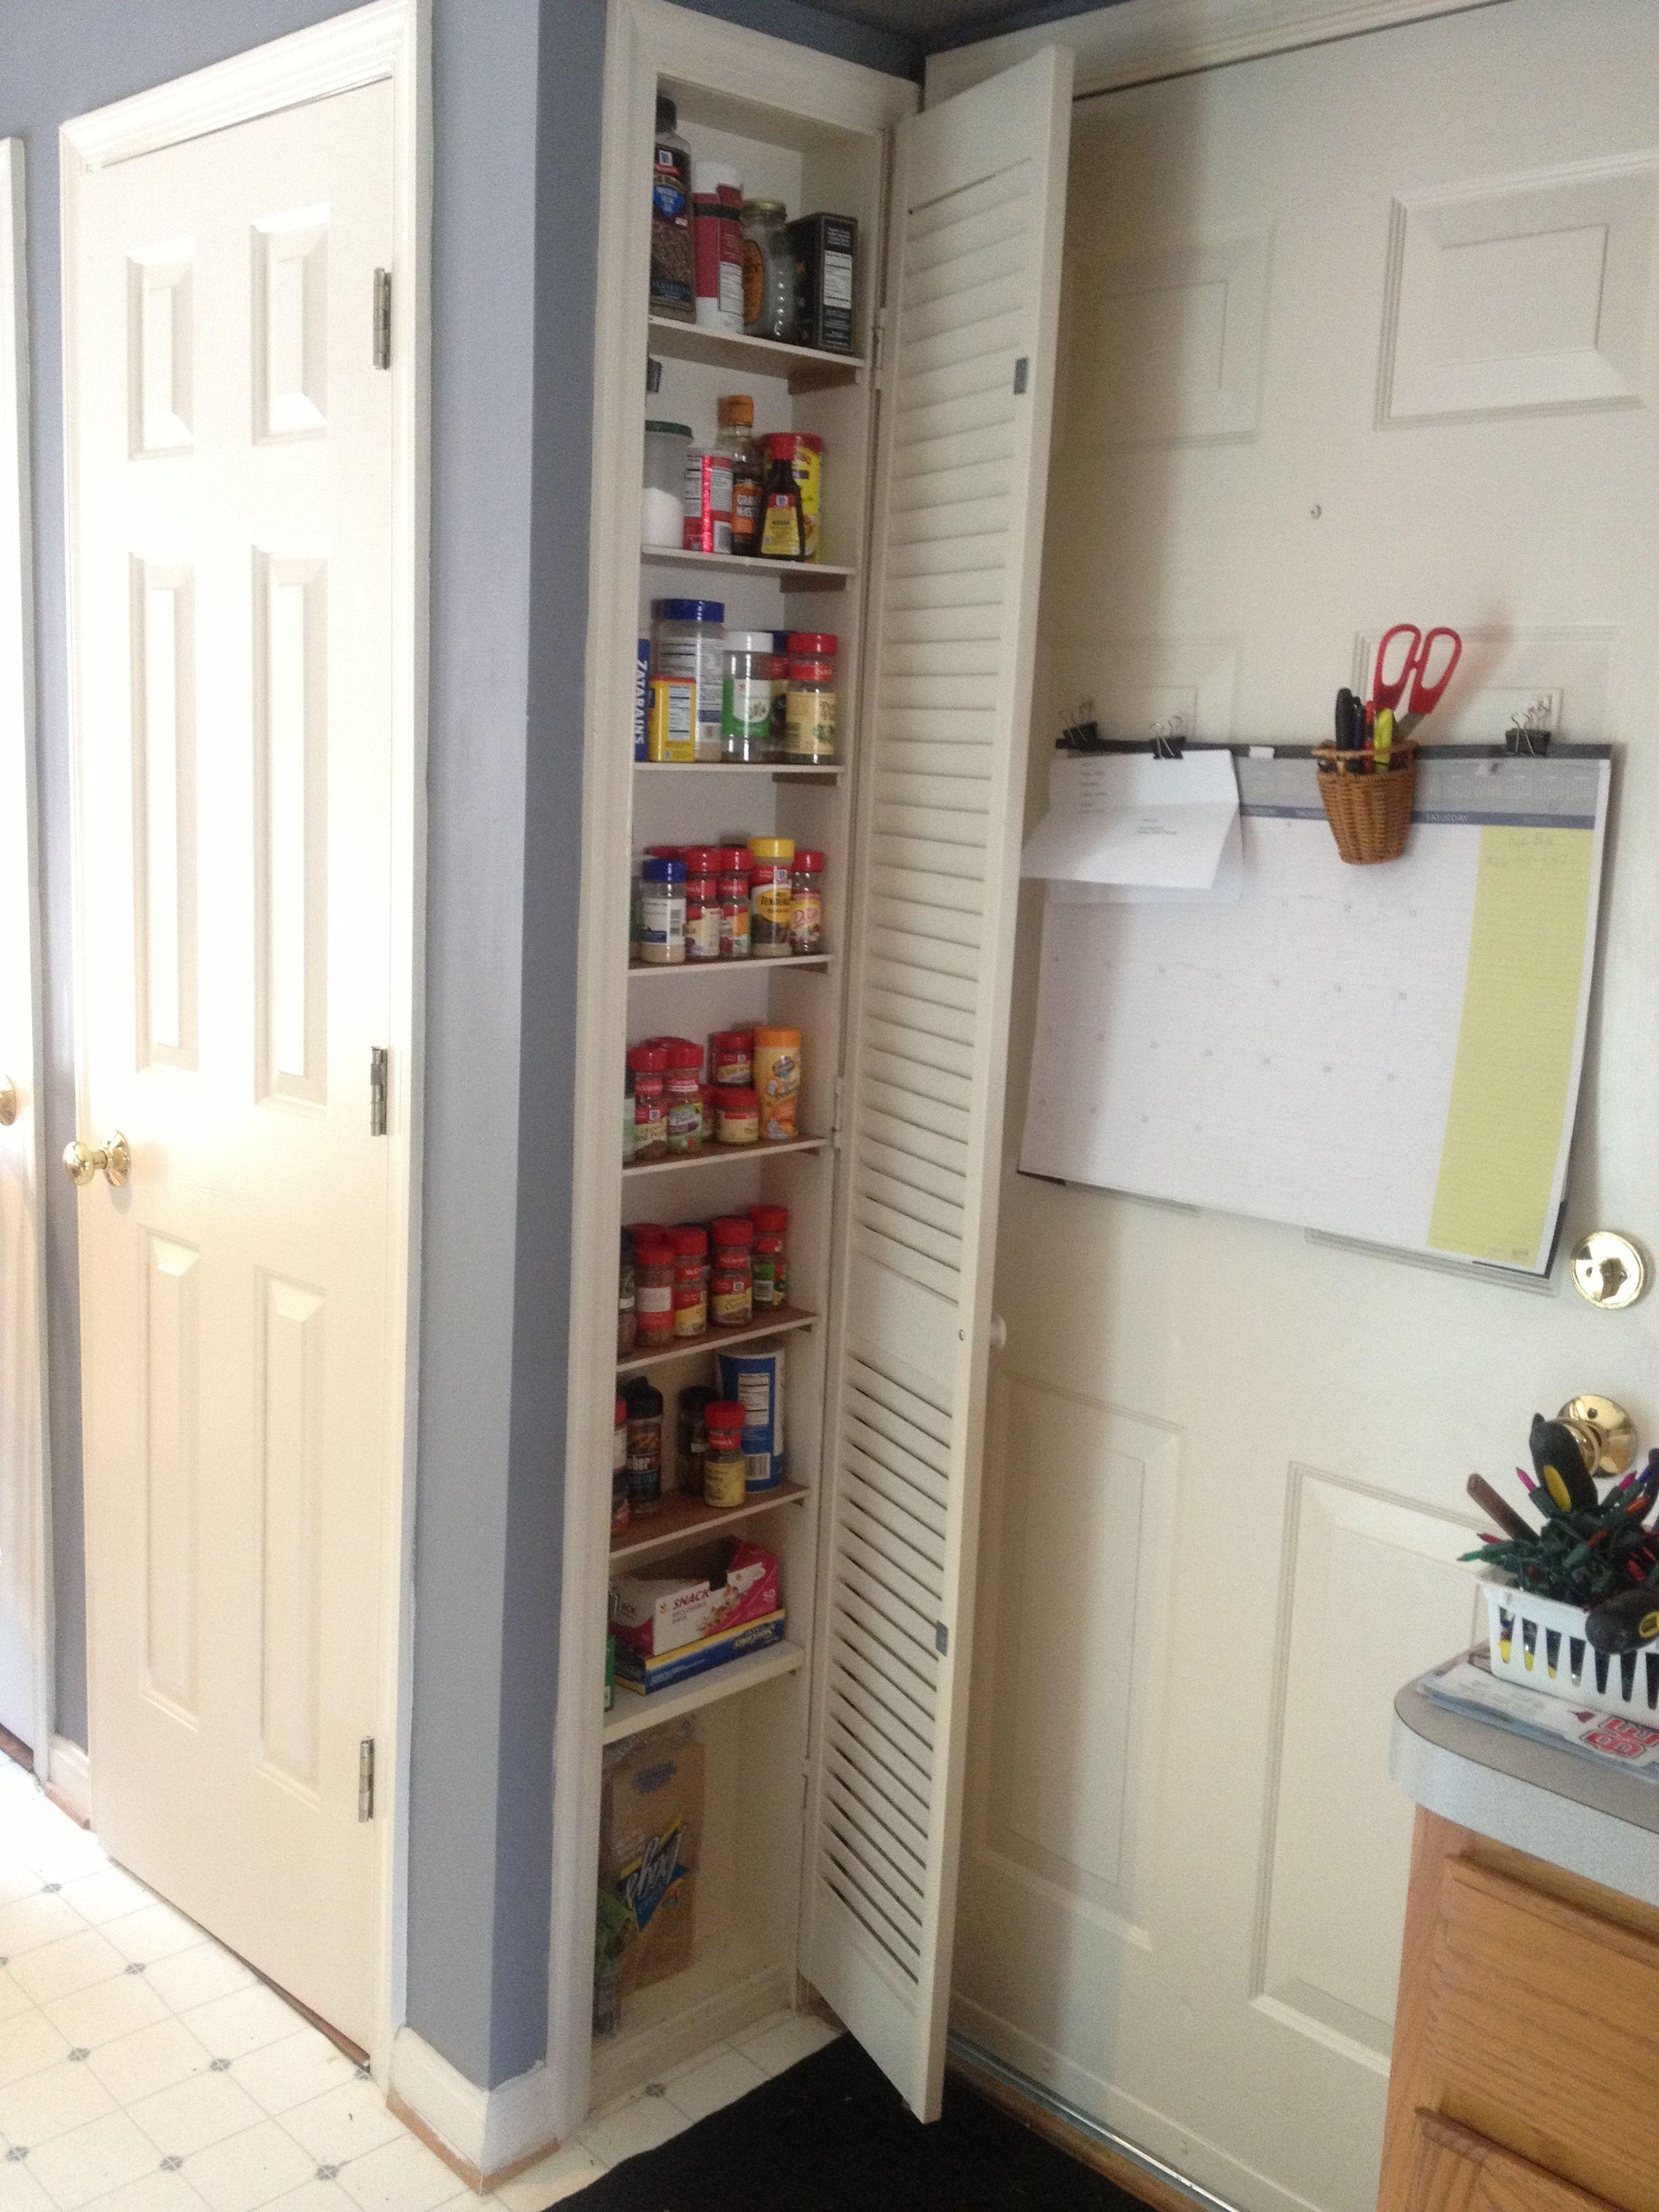 Pin By Emily Strong Schoenebeck On Projects I Have Done Bathroom Organization Diy Diy Bathroom Bathroom Organization